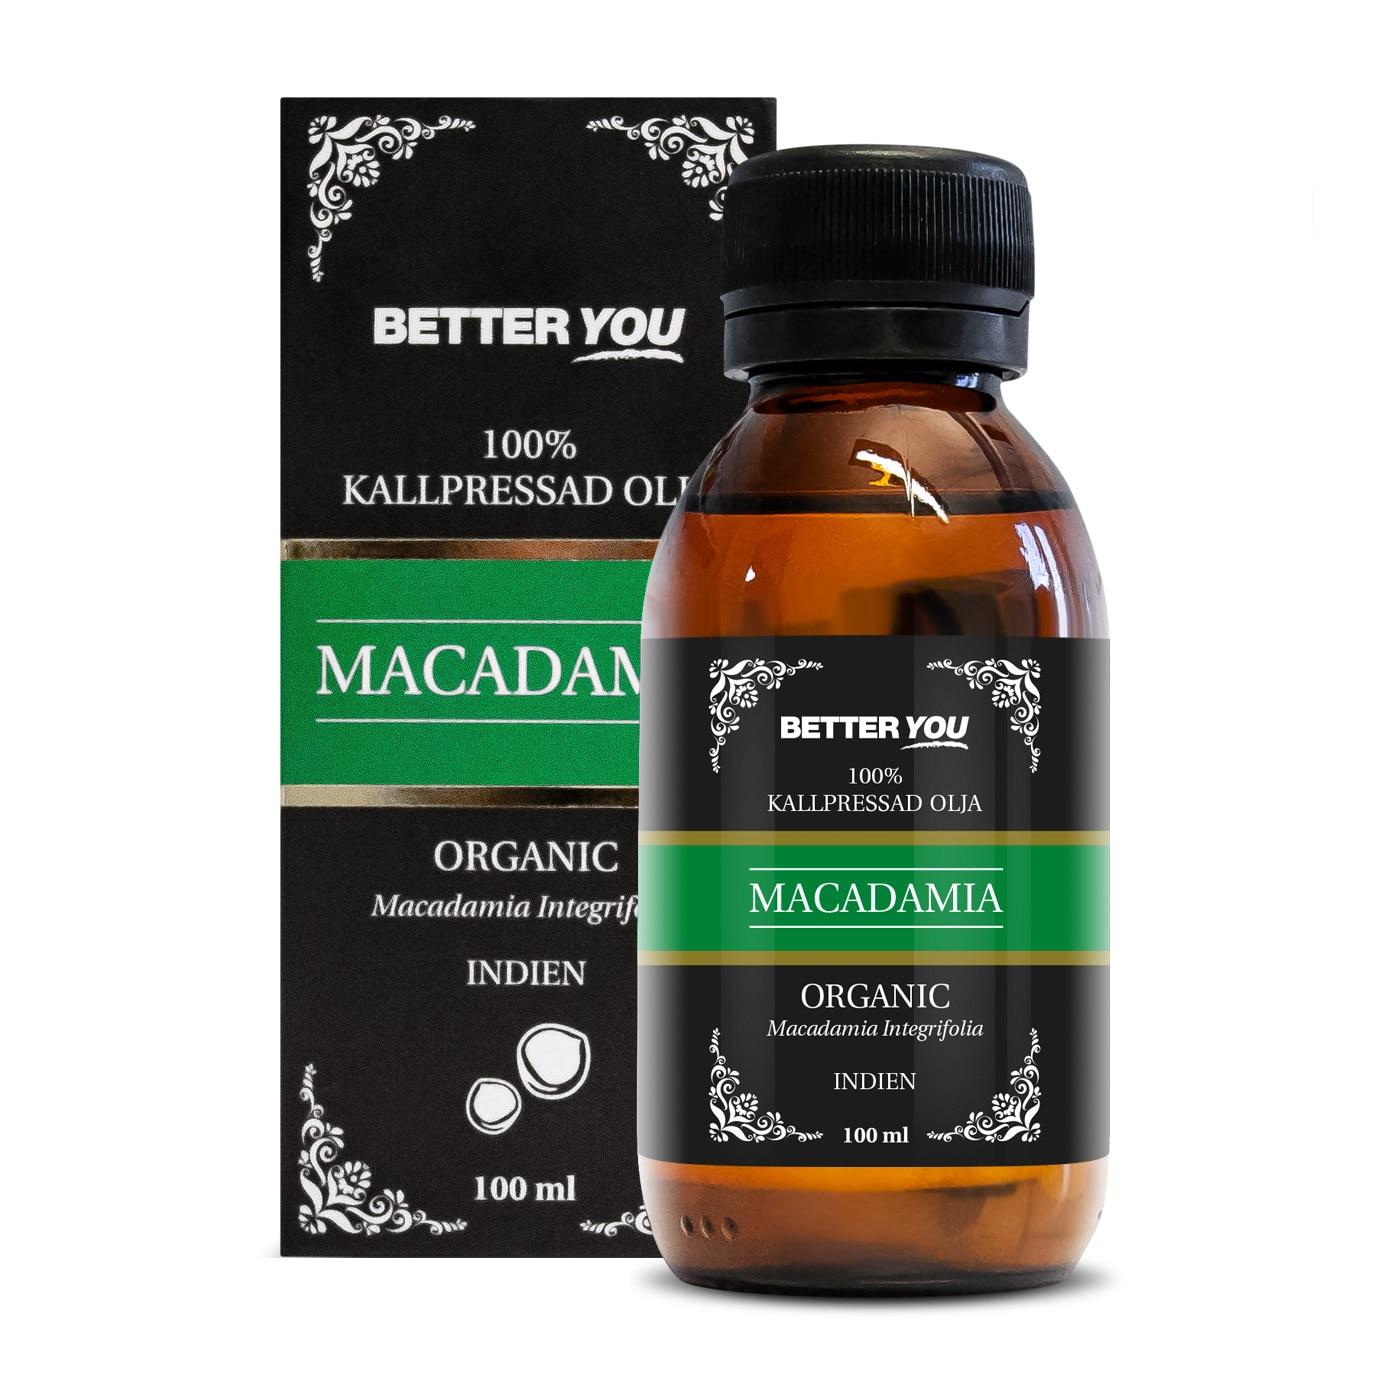 Macadamiaolja EKO - Kallpressad